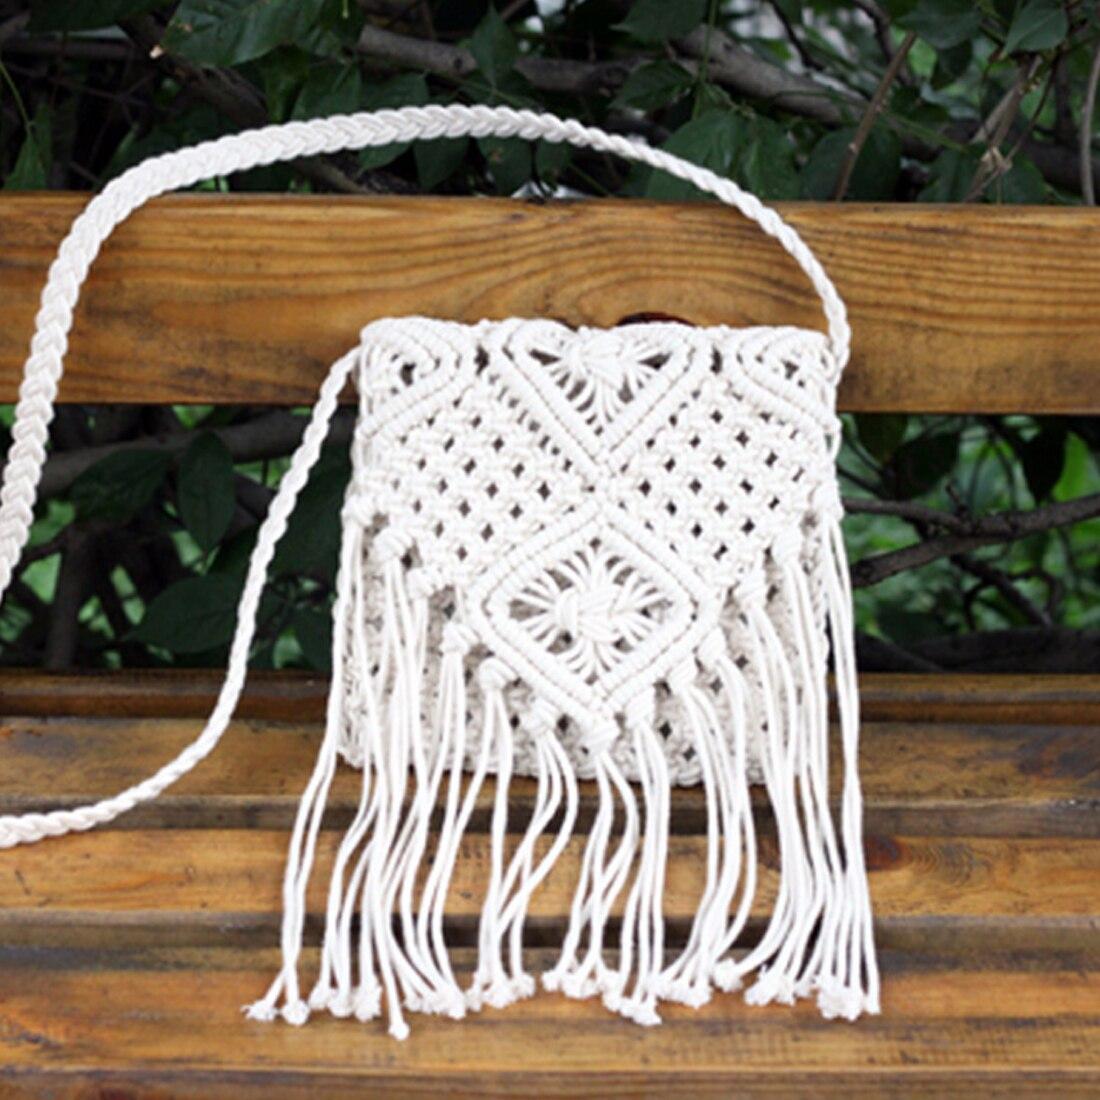 2018 Hot Wind Cotton Thread Knitting Cross-body Bag Single-shoulder Bag with Tassels For Women Female Travel